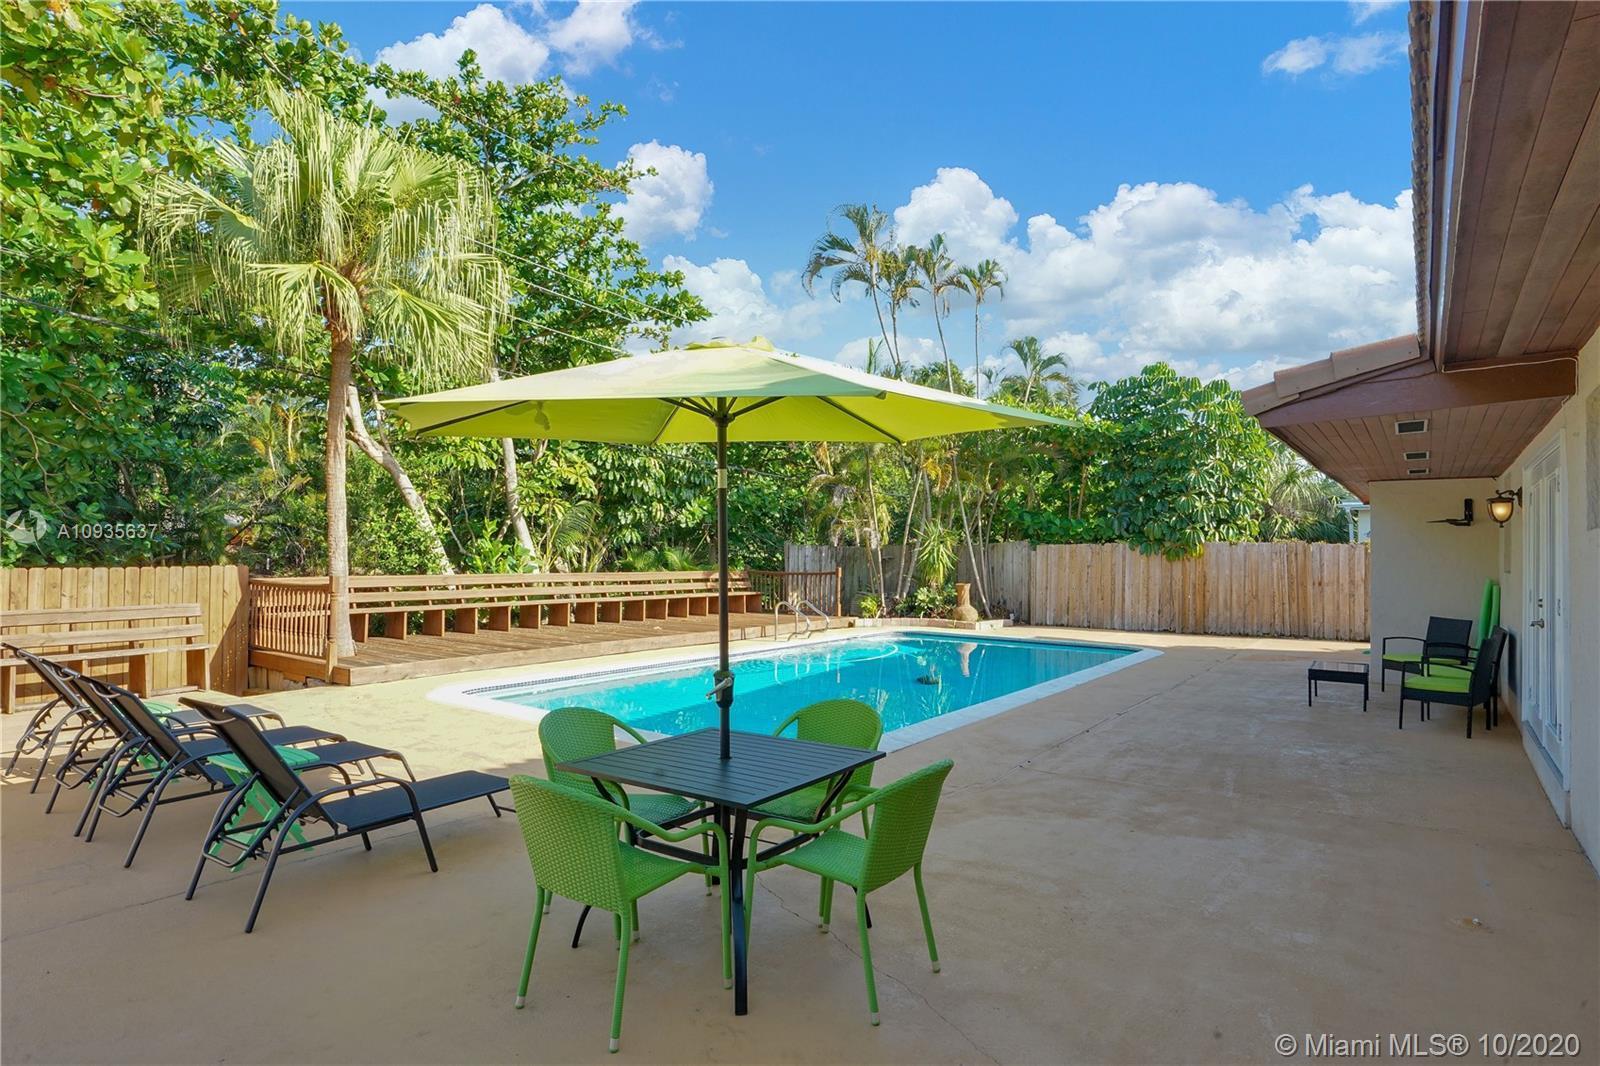 Stunning 3 bedroom, 2 bathroom waterfront home in the Riverland neighborhood of Ft. Lauderdale. Feat